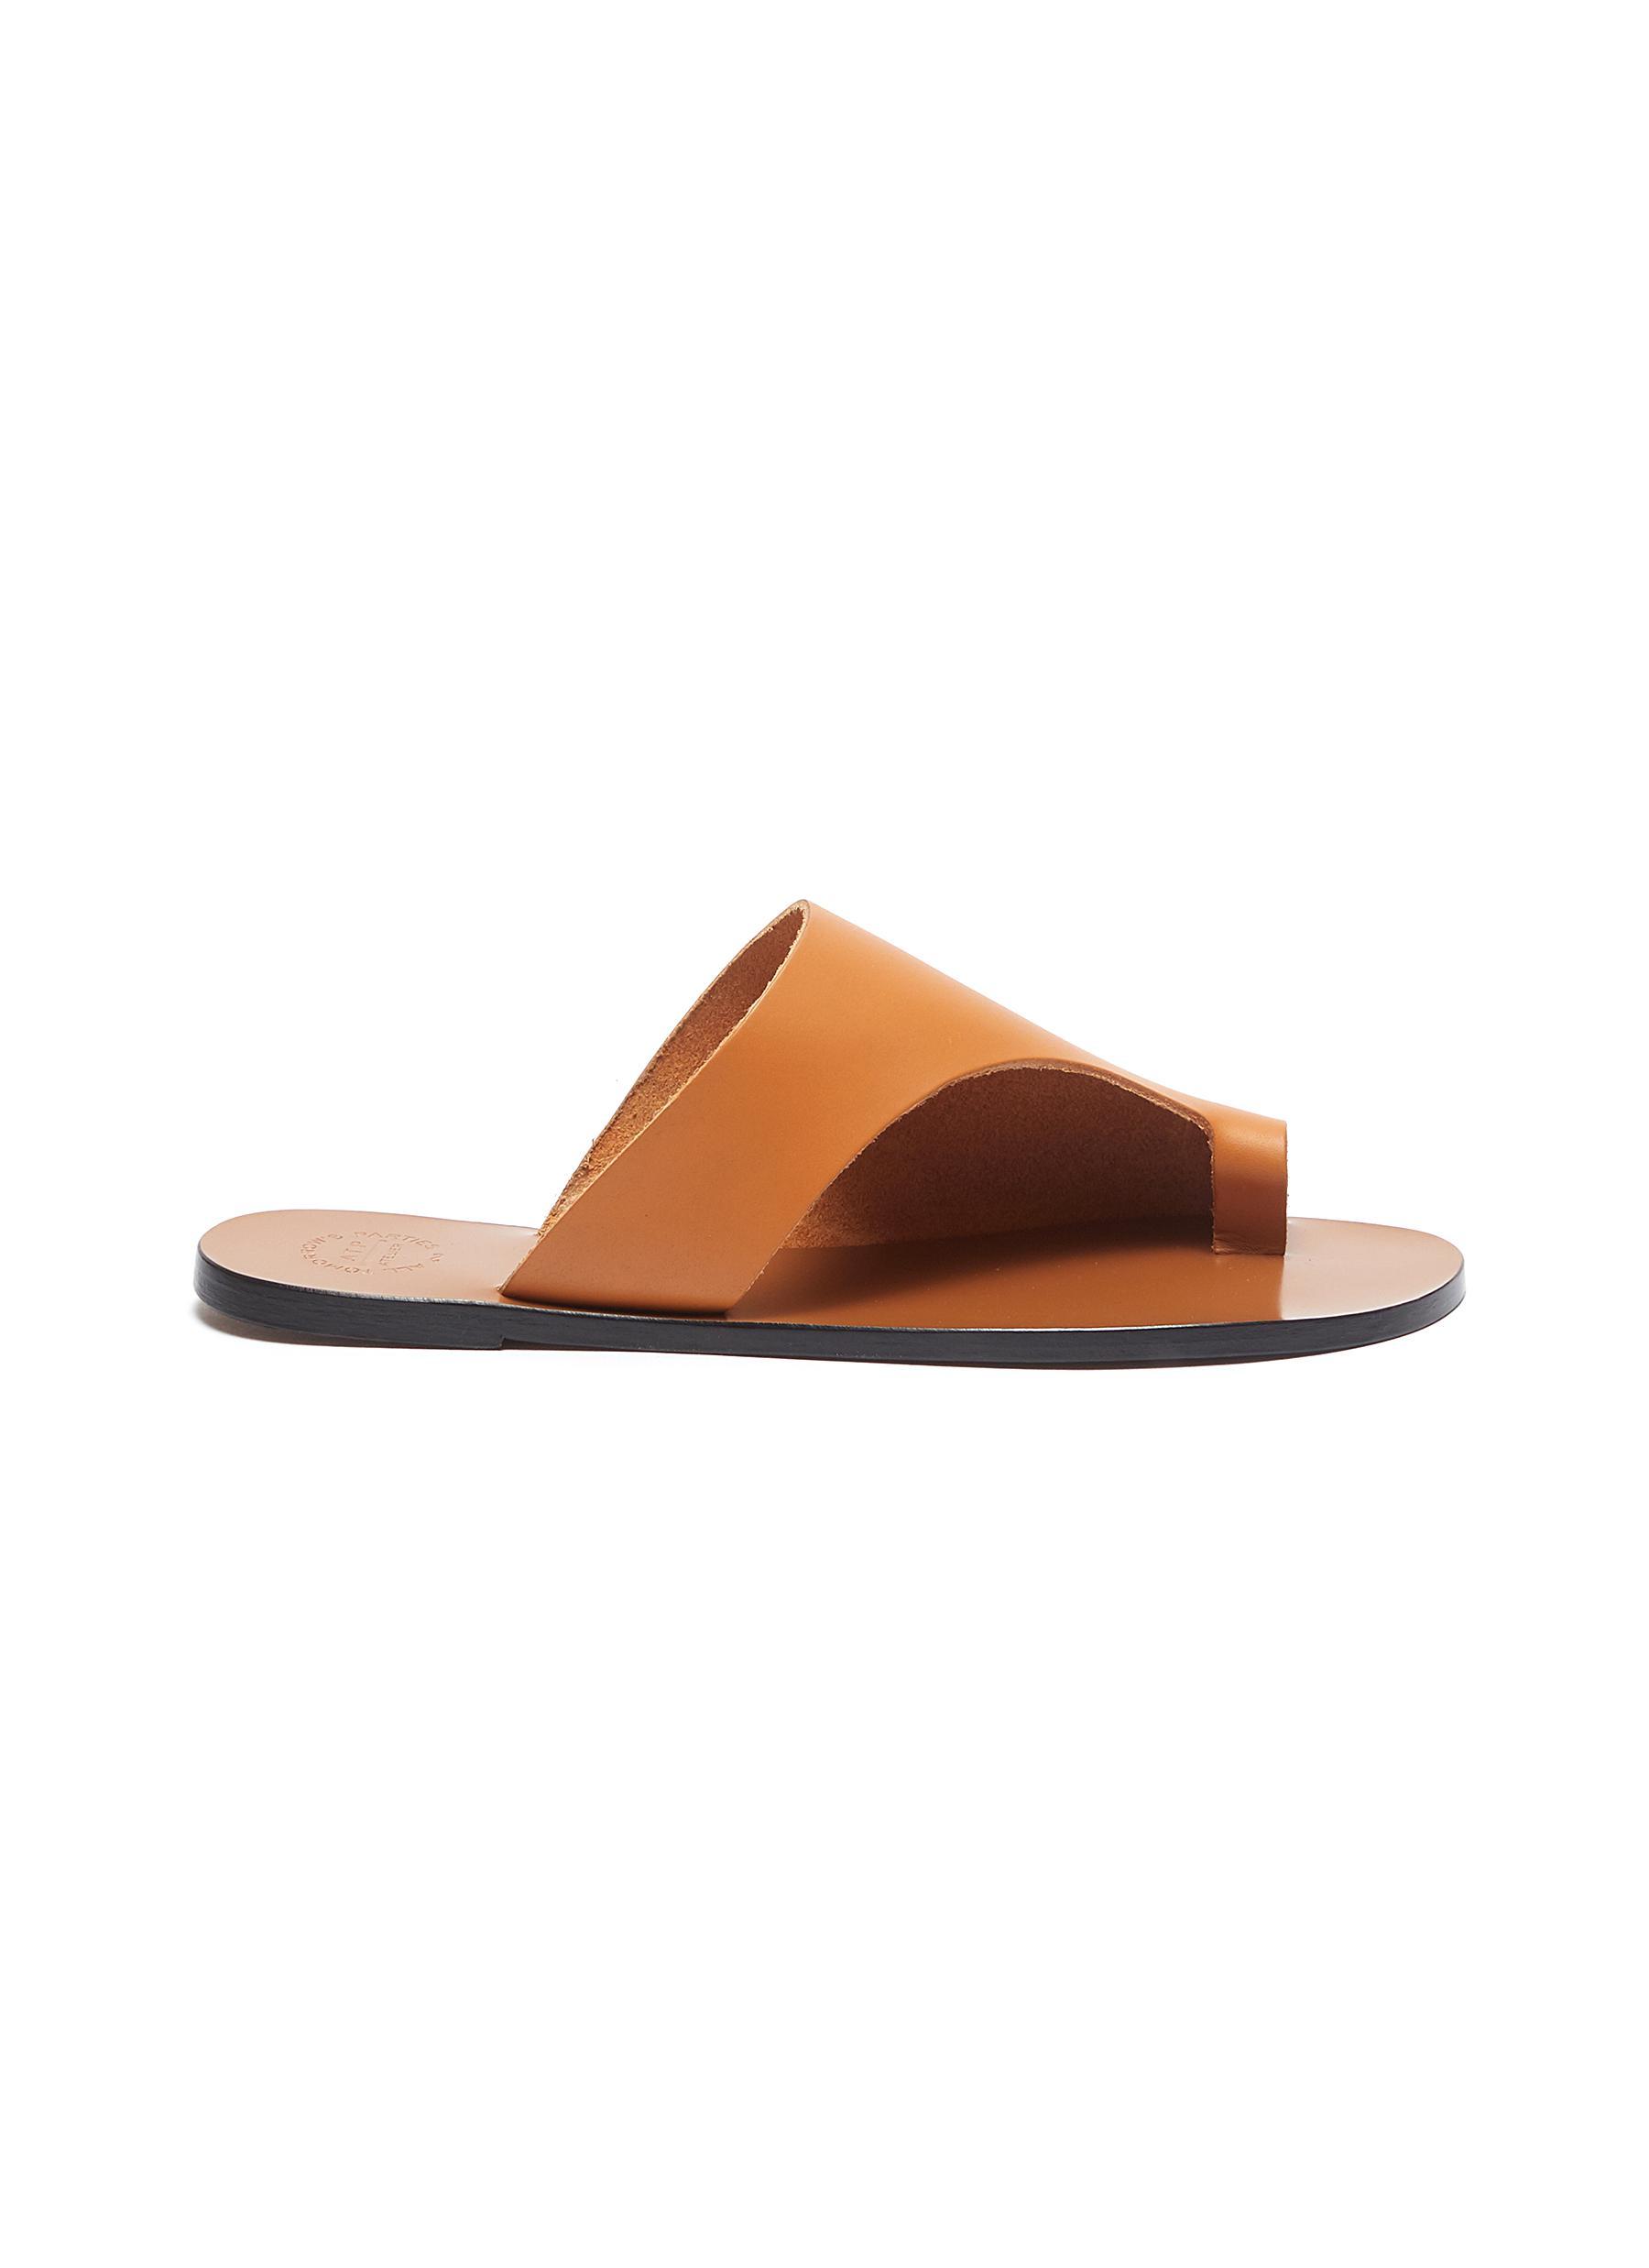 Rosa cutout leather slide sandals by Atp Atelier